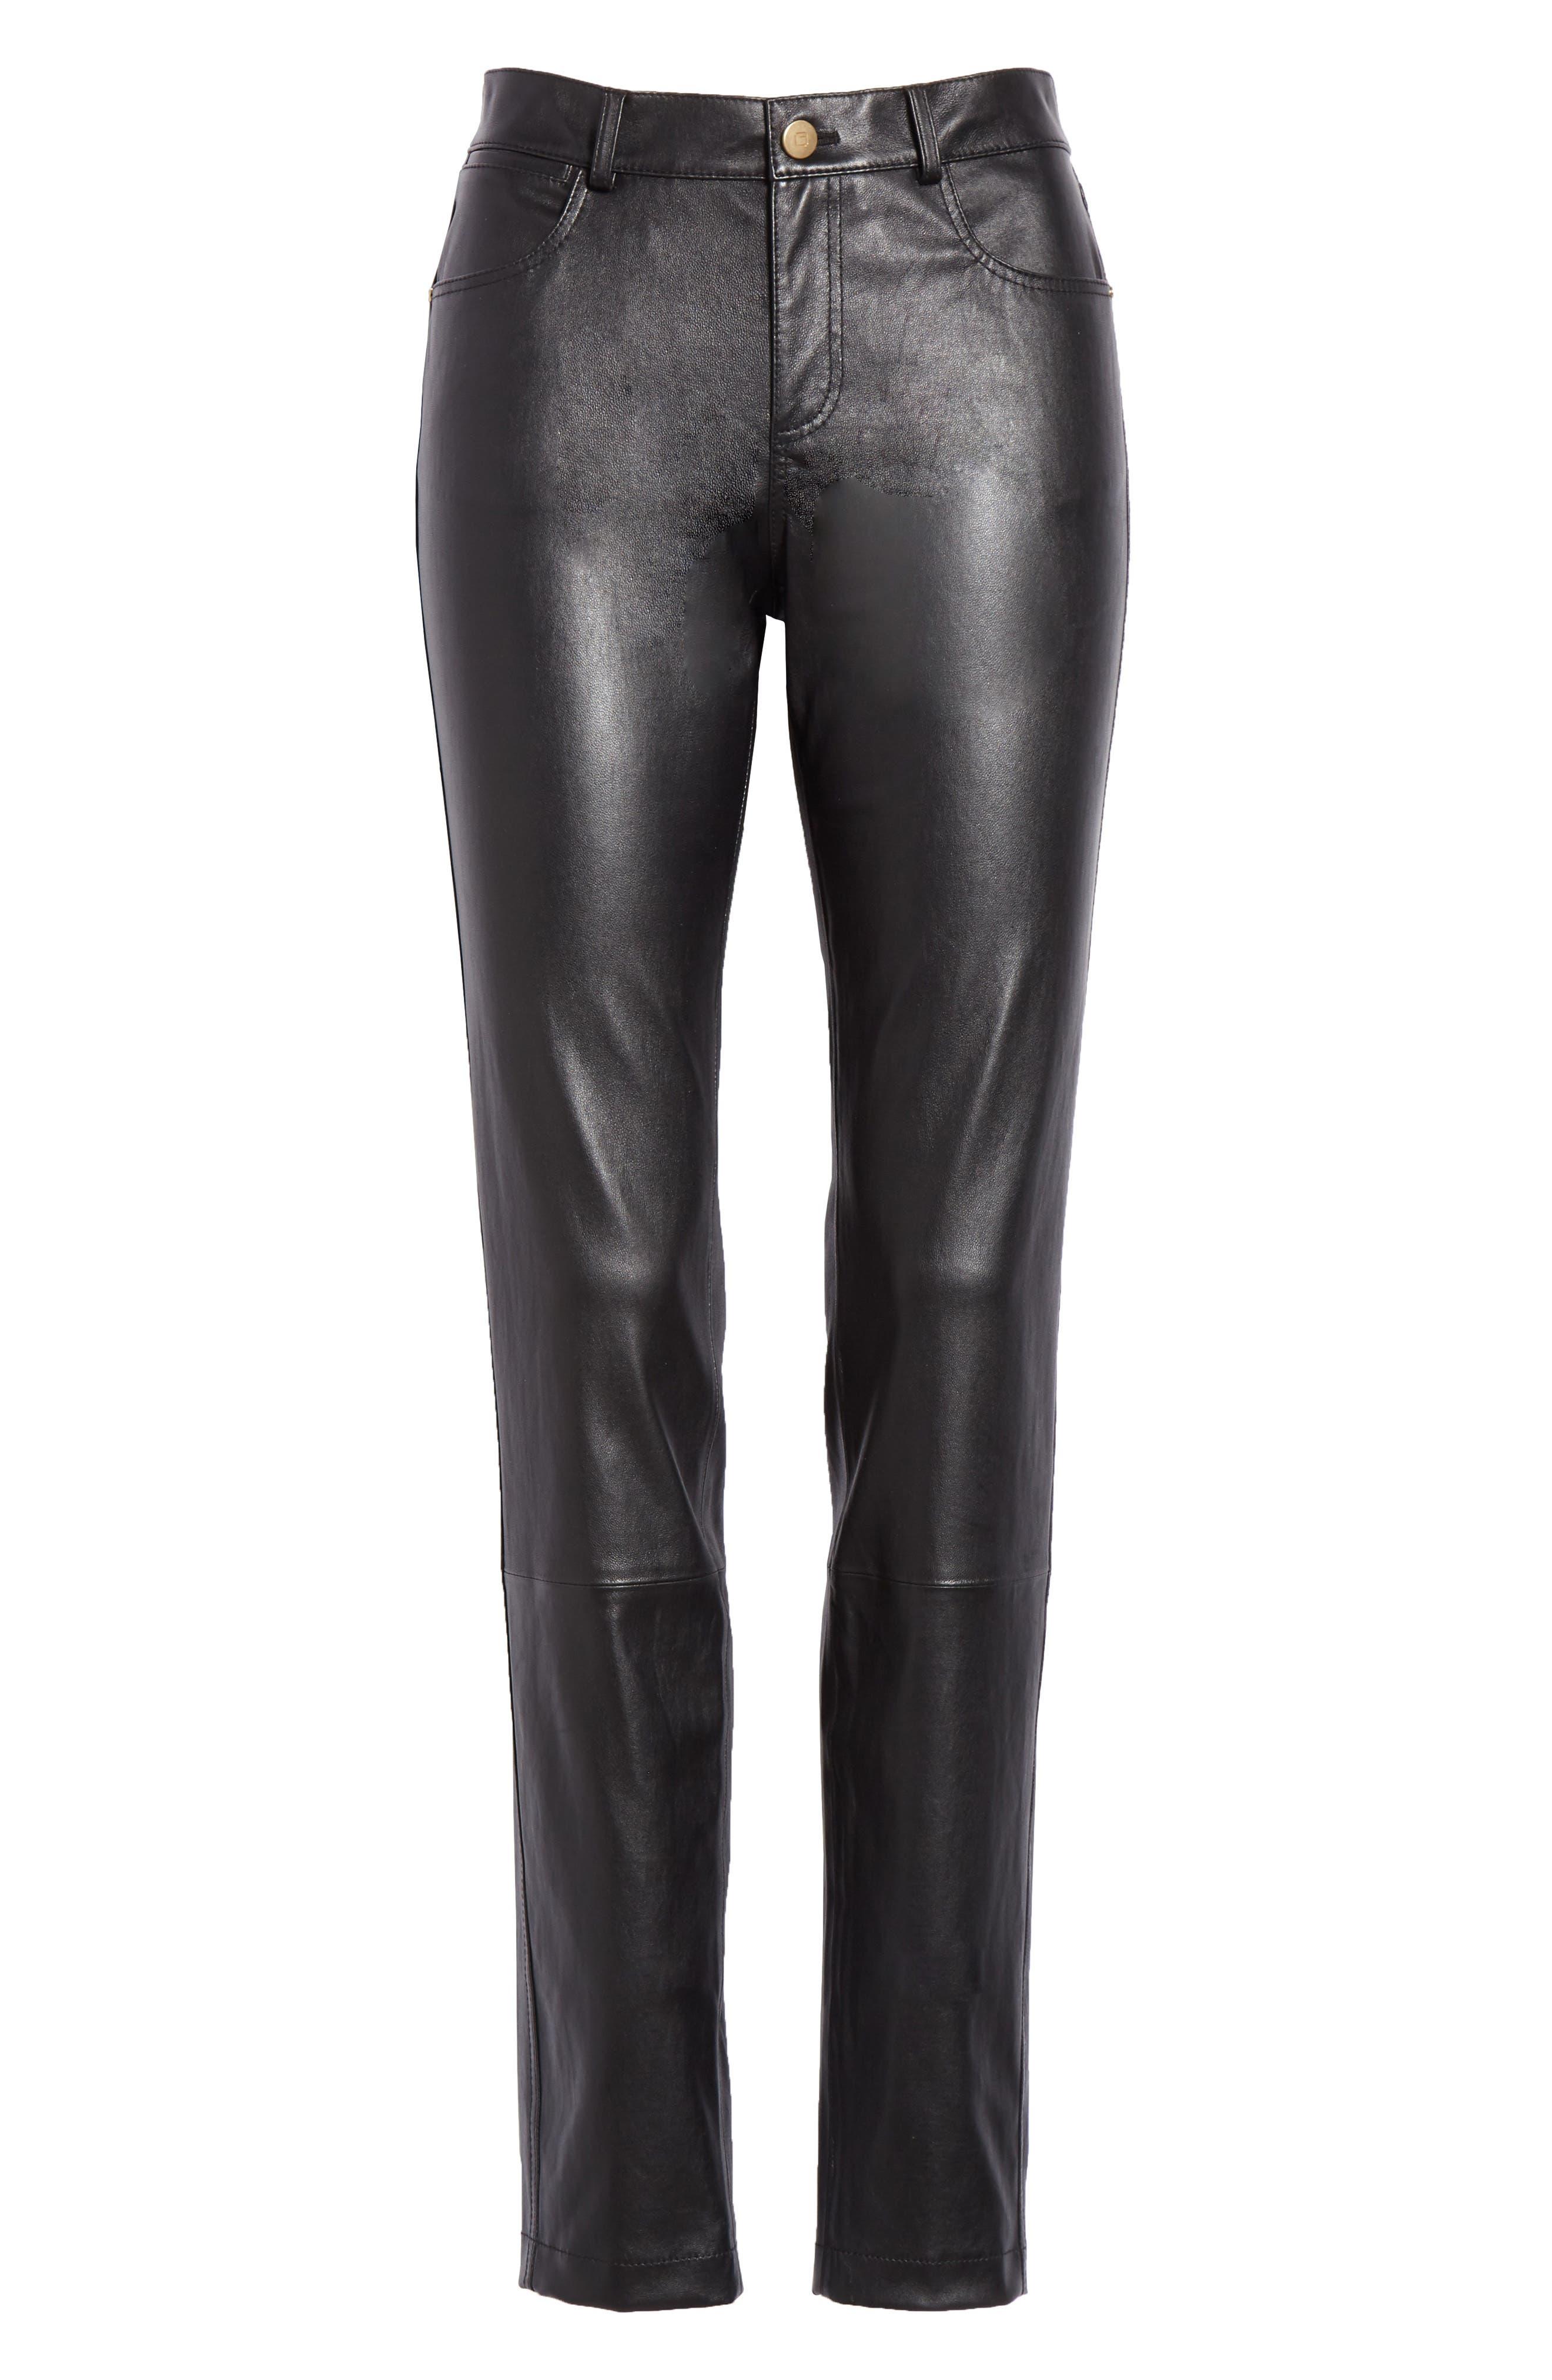 Mercer Nappa Leather Pants,                             Alternate thumbnail 6, color,                             BLACK